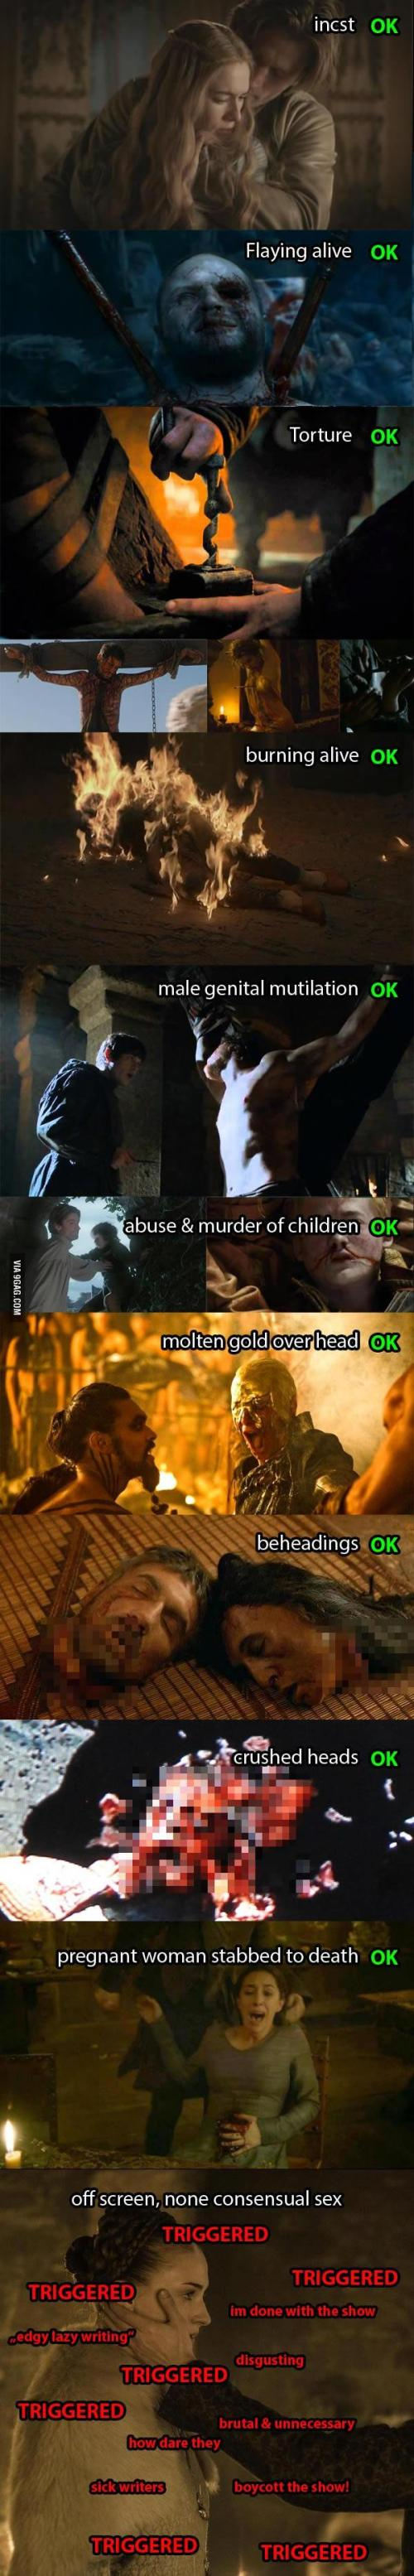 Game of Thrones Vergewaltigungen